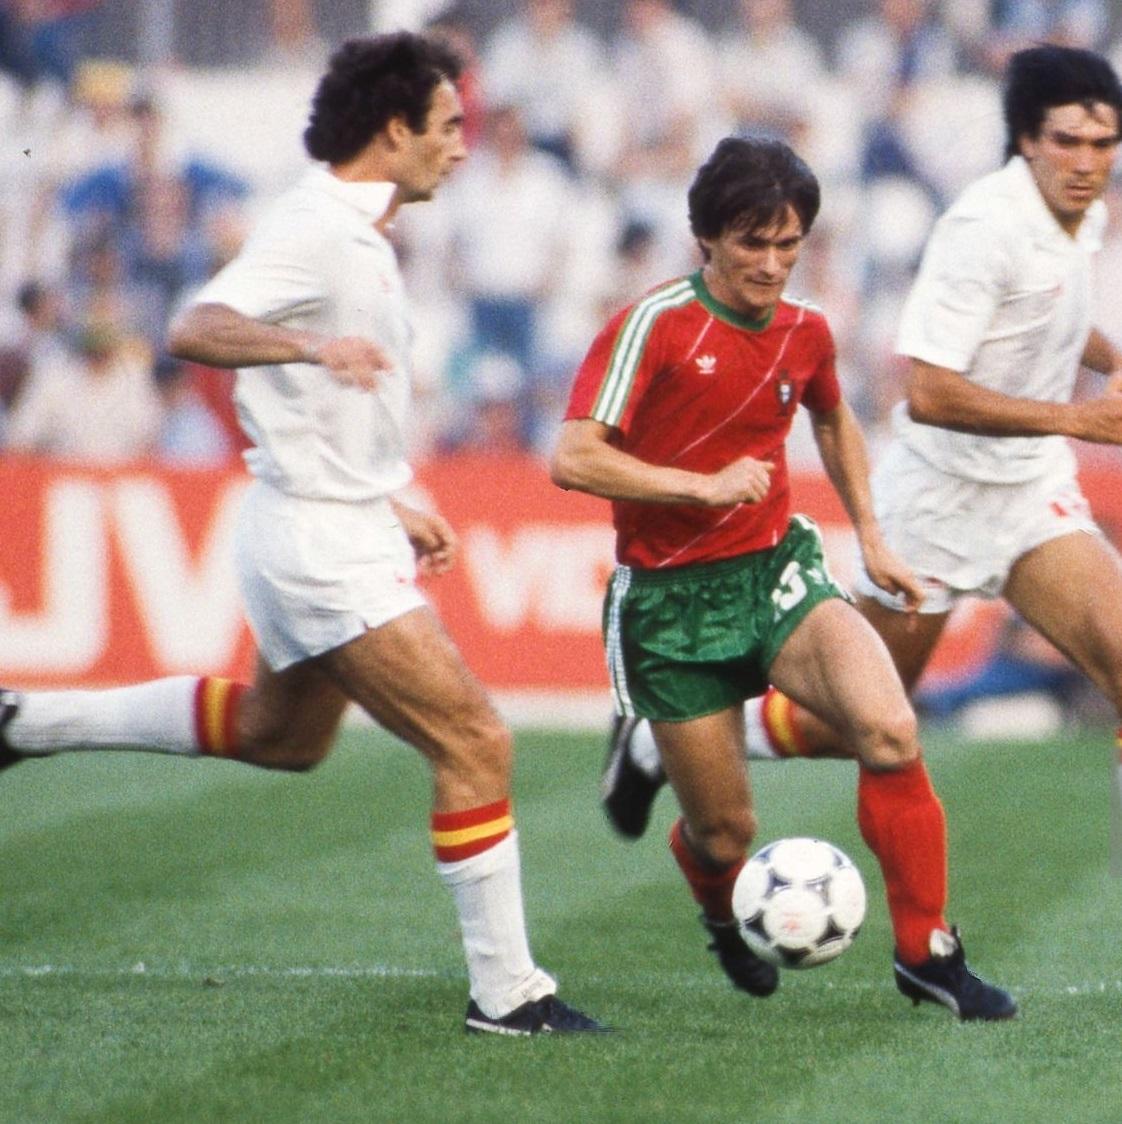 idokapszula_1984_franciaorszagi_labdarugo_europa-bajnoksag_csoportkorok_spanyolorszag_portugalia_sousa.jpg